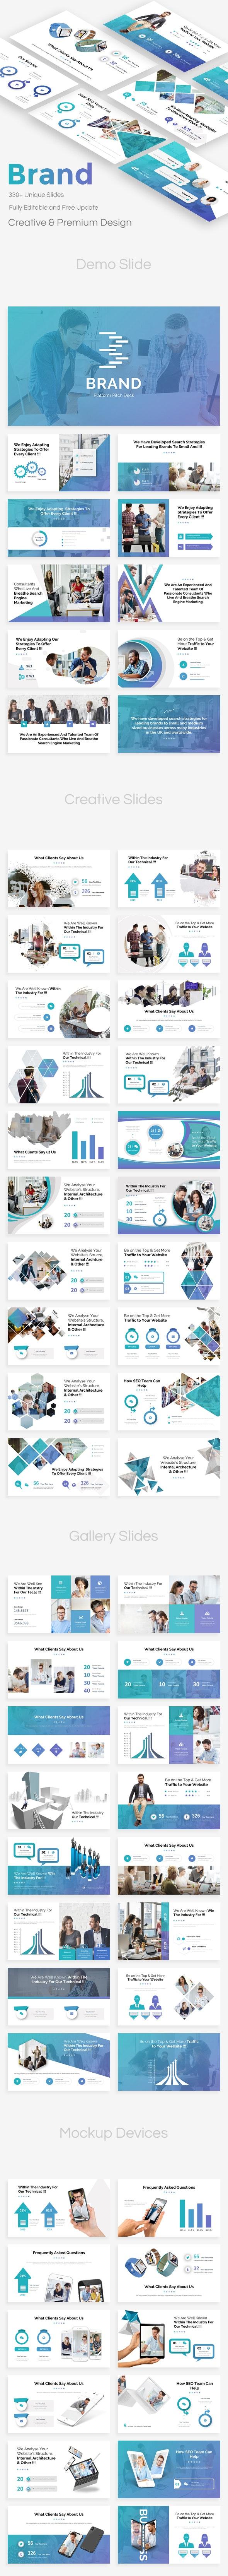 Brand Platform Pitch Deck Keynote Template - Business Keynote Templates